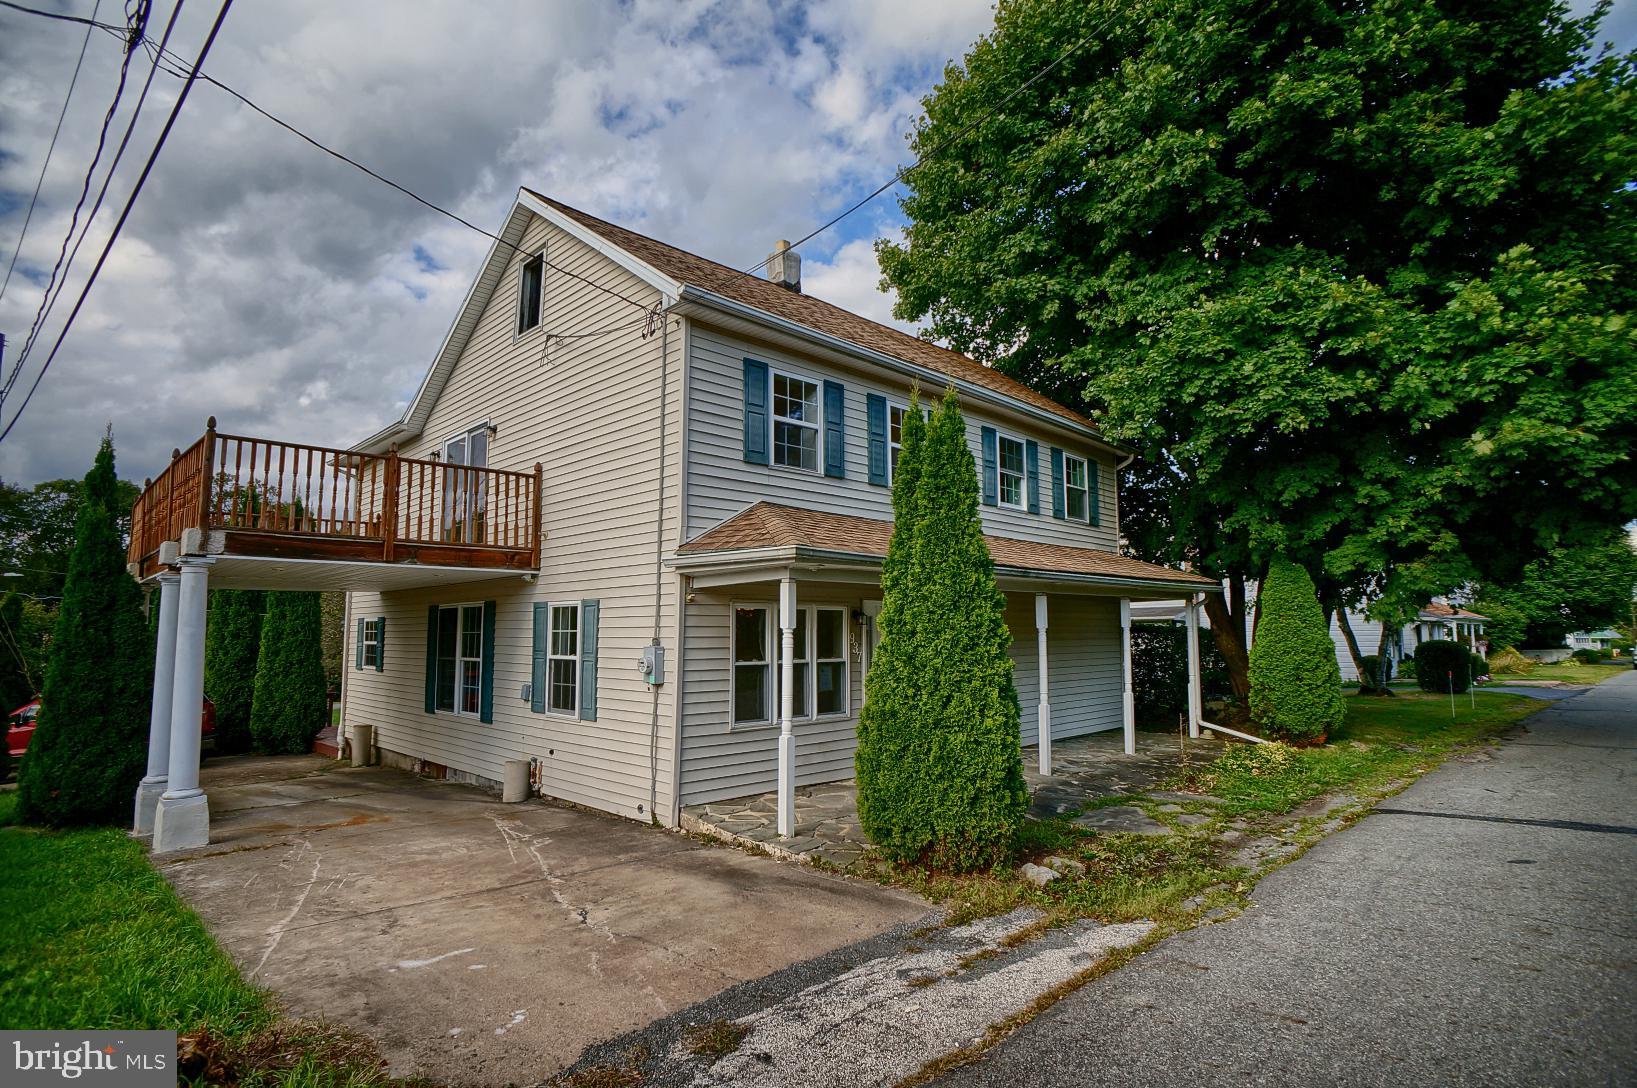 937 SCHWABE STREET, FREELAND, PA 18224